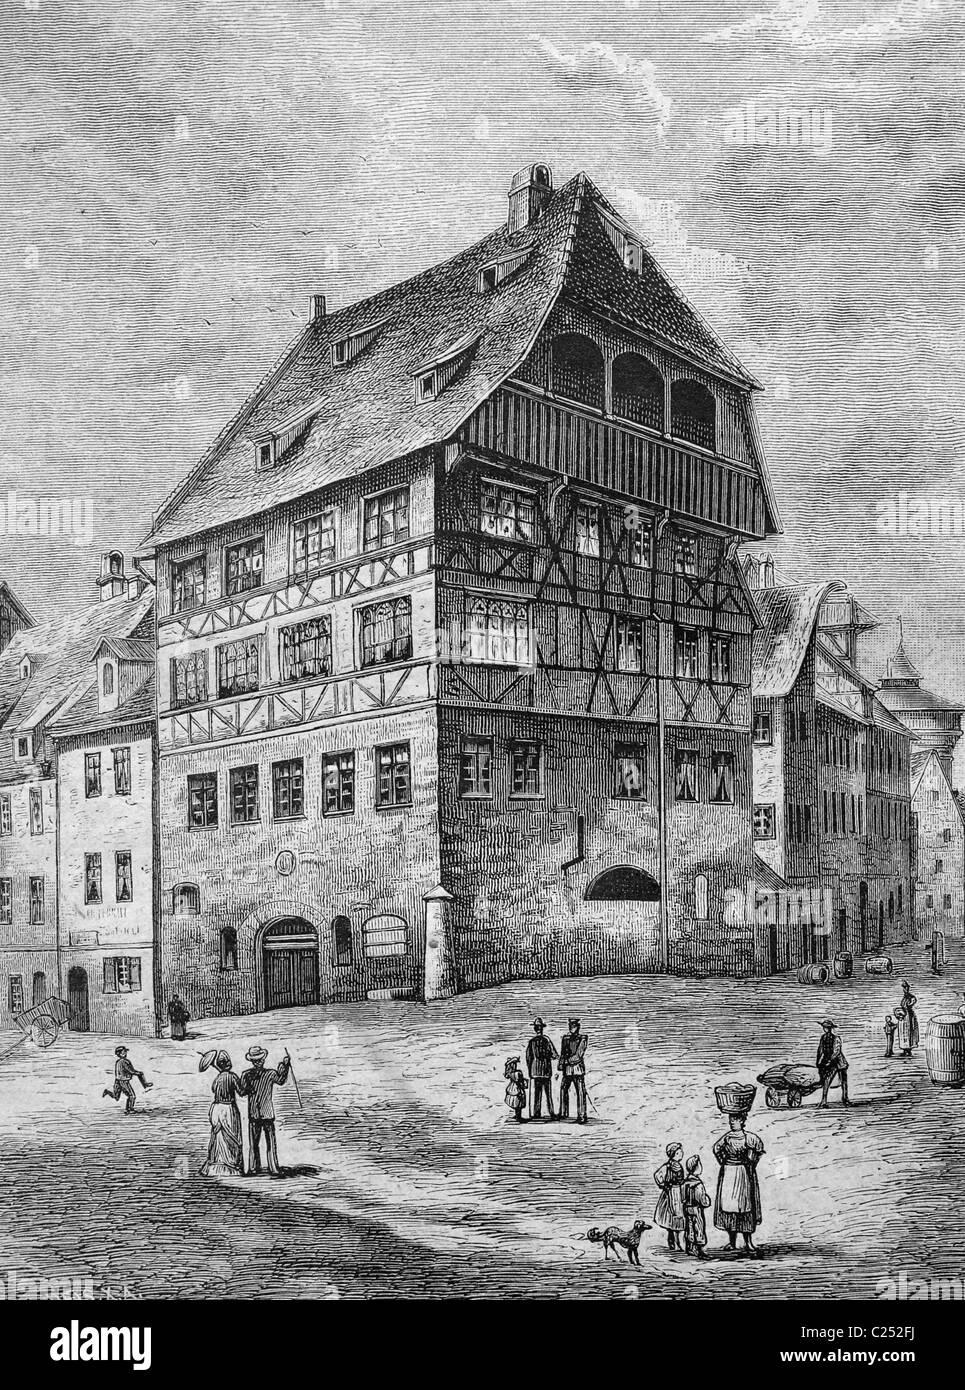 Albrecht-Dürer-Haus-Haus in Nürnberg, Deutschland, historische Abbildung, 1877 Stockbild